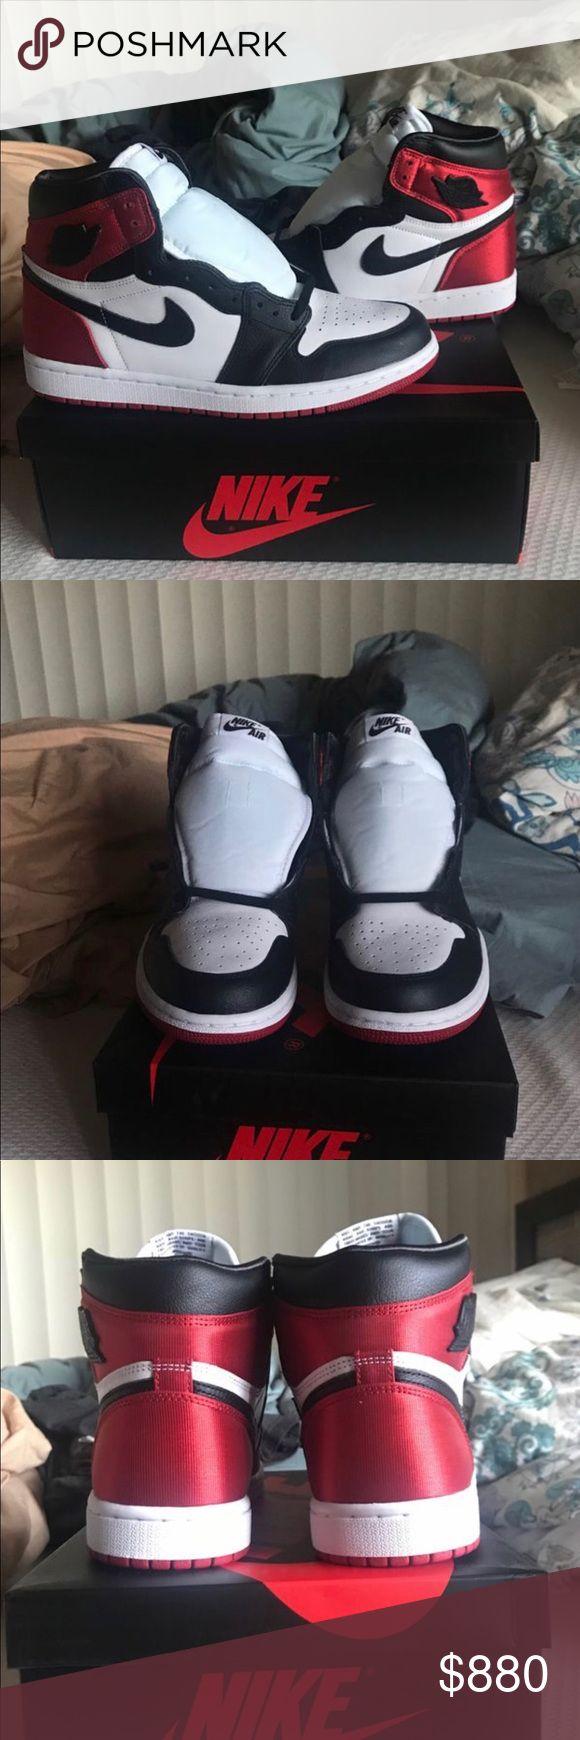 Jordan 1 satin black toe size 9.5 W / 8 M Brand New ! D.S